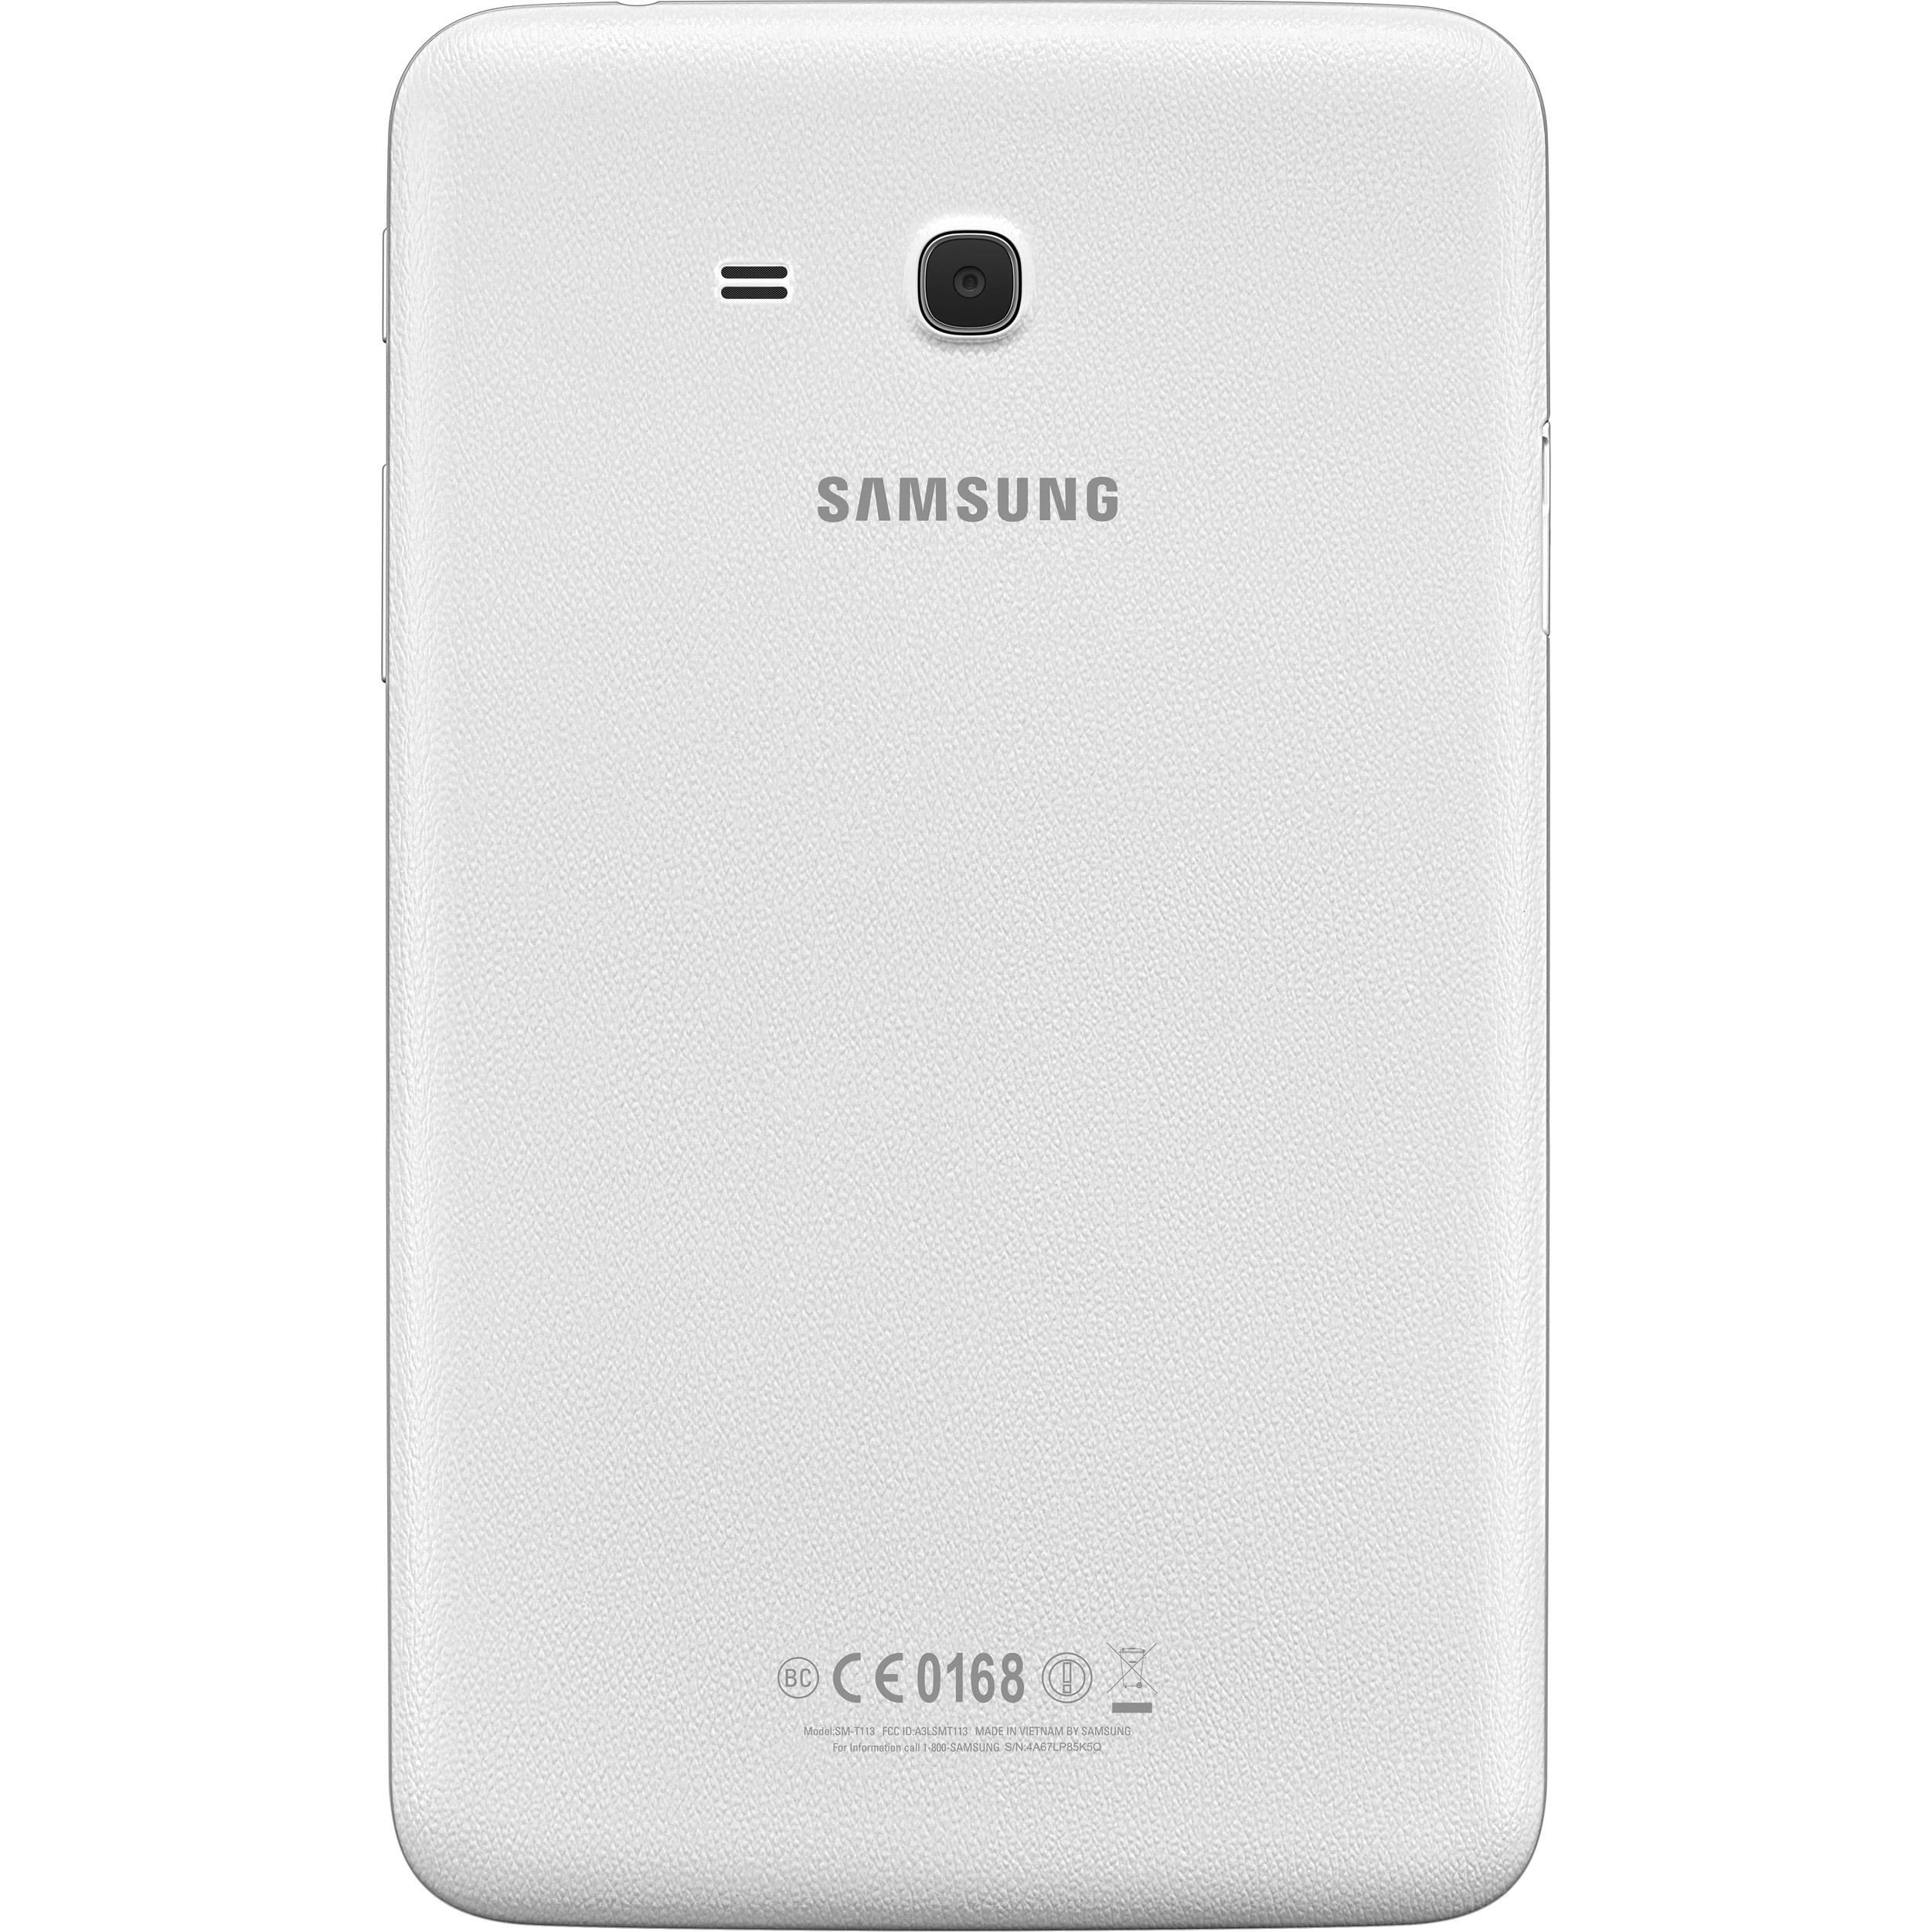 Samsung 7 0